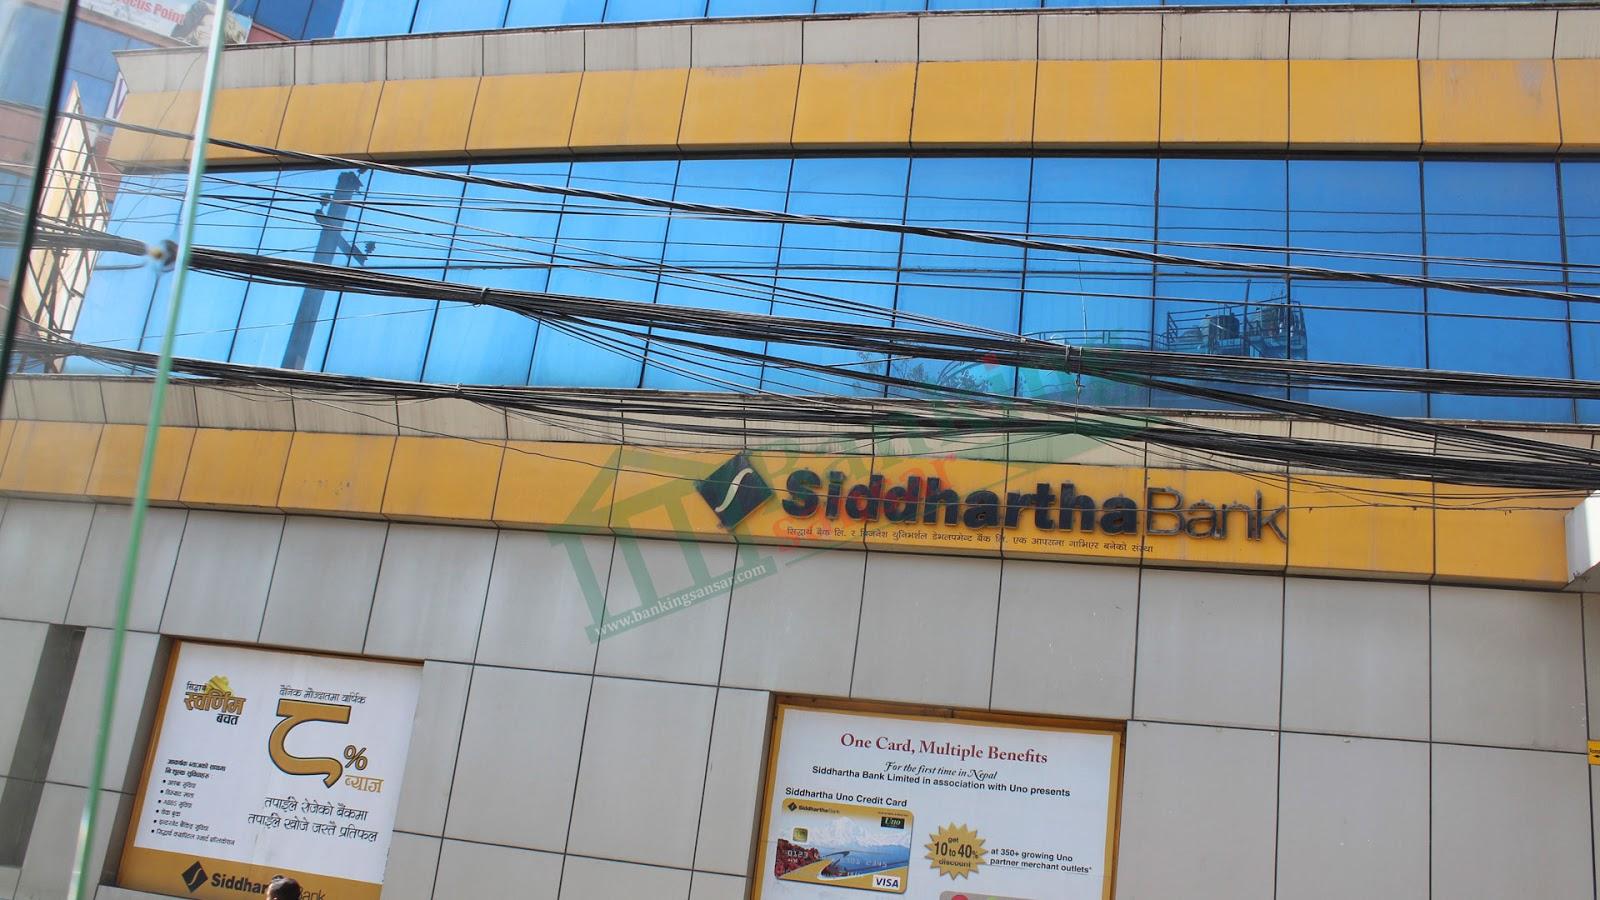 Siddhartha Bank